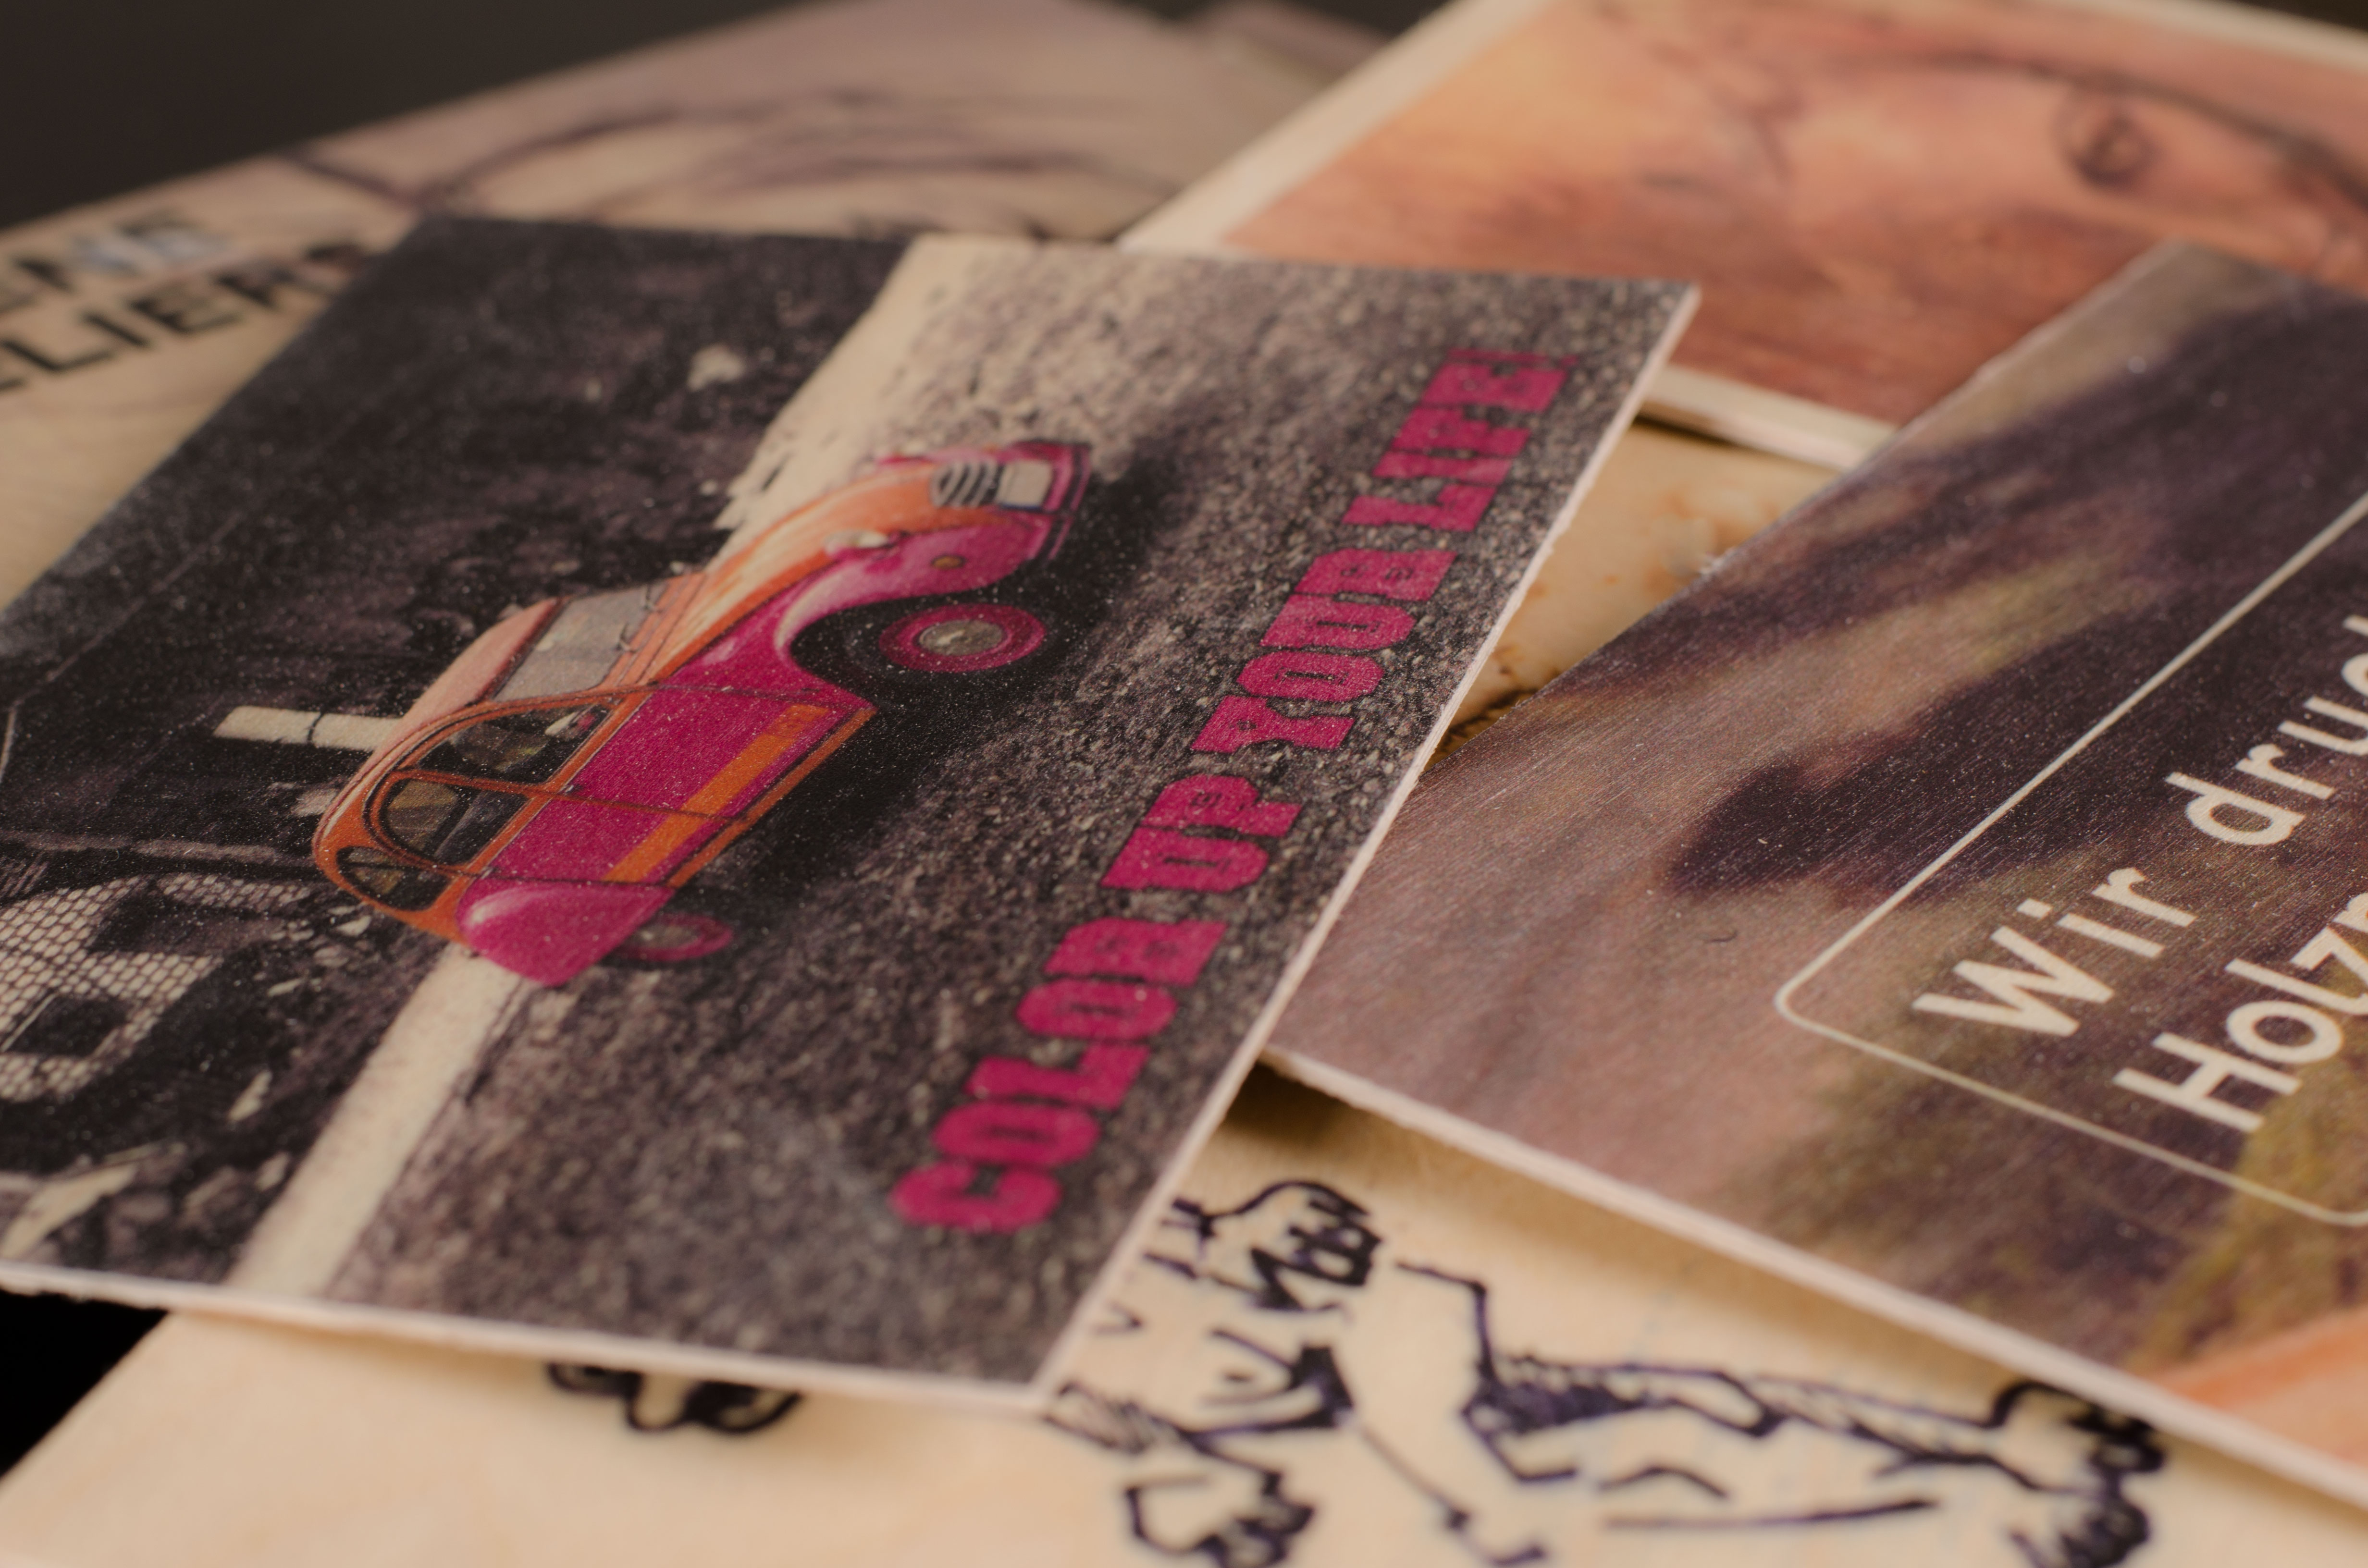 druck auf holz postkarte bedrucken lassen. Black Bedroom Furniture Sets. Home Design Ideas